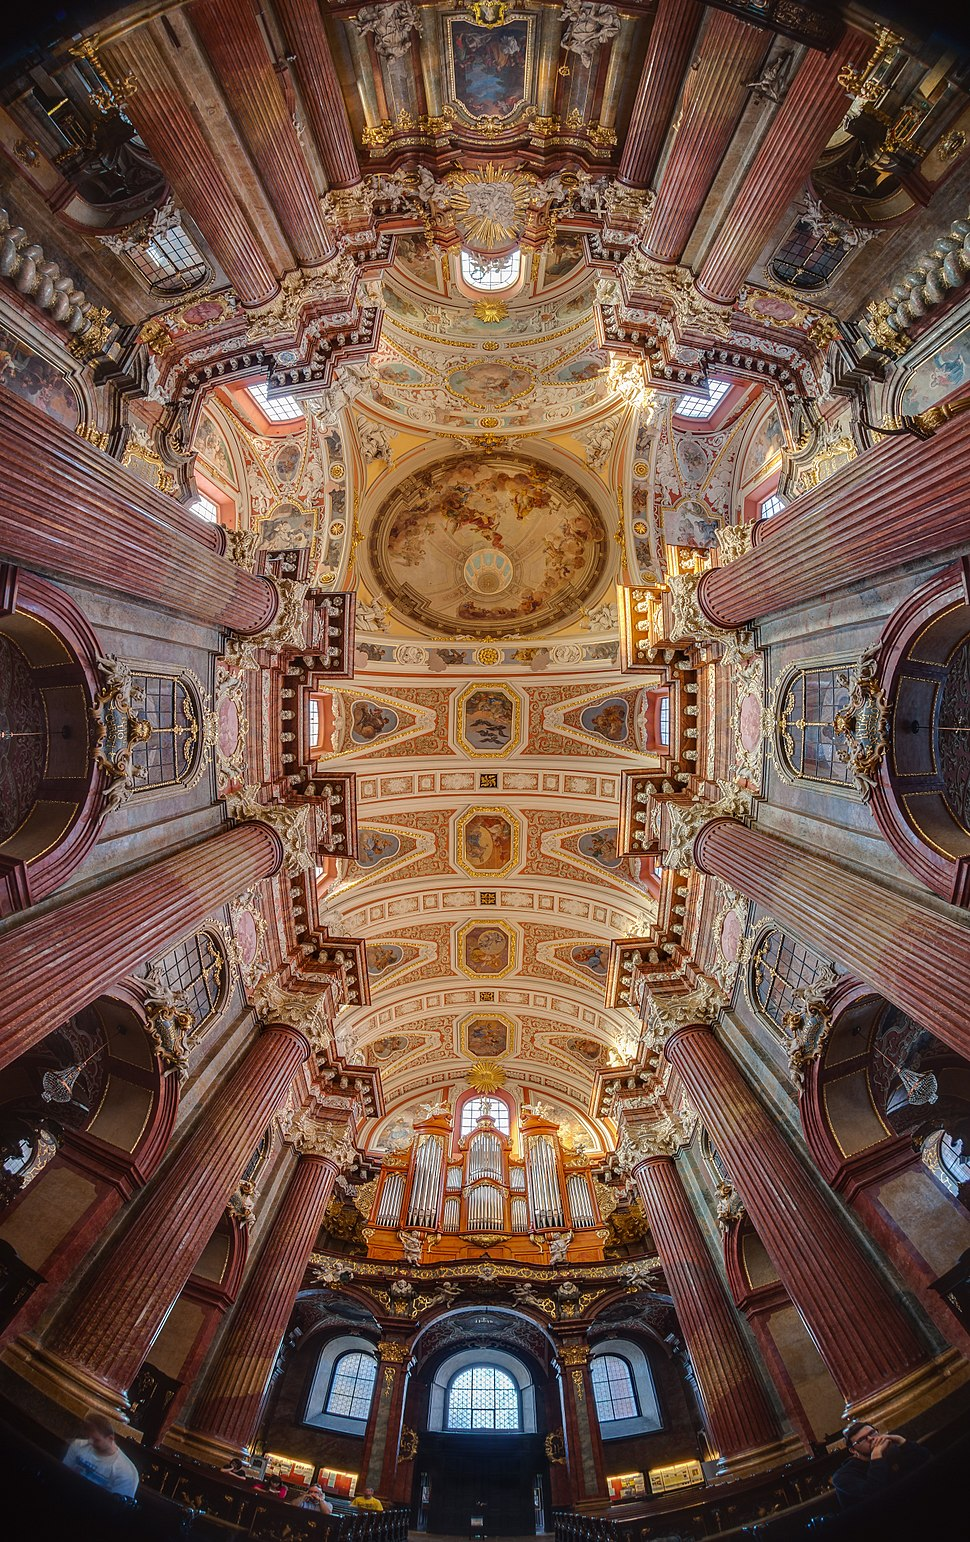 Iglesia colegial de Poznan, Poznan, Polonia, 2014-09-18, DD 28-30 HDR